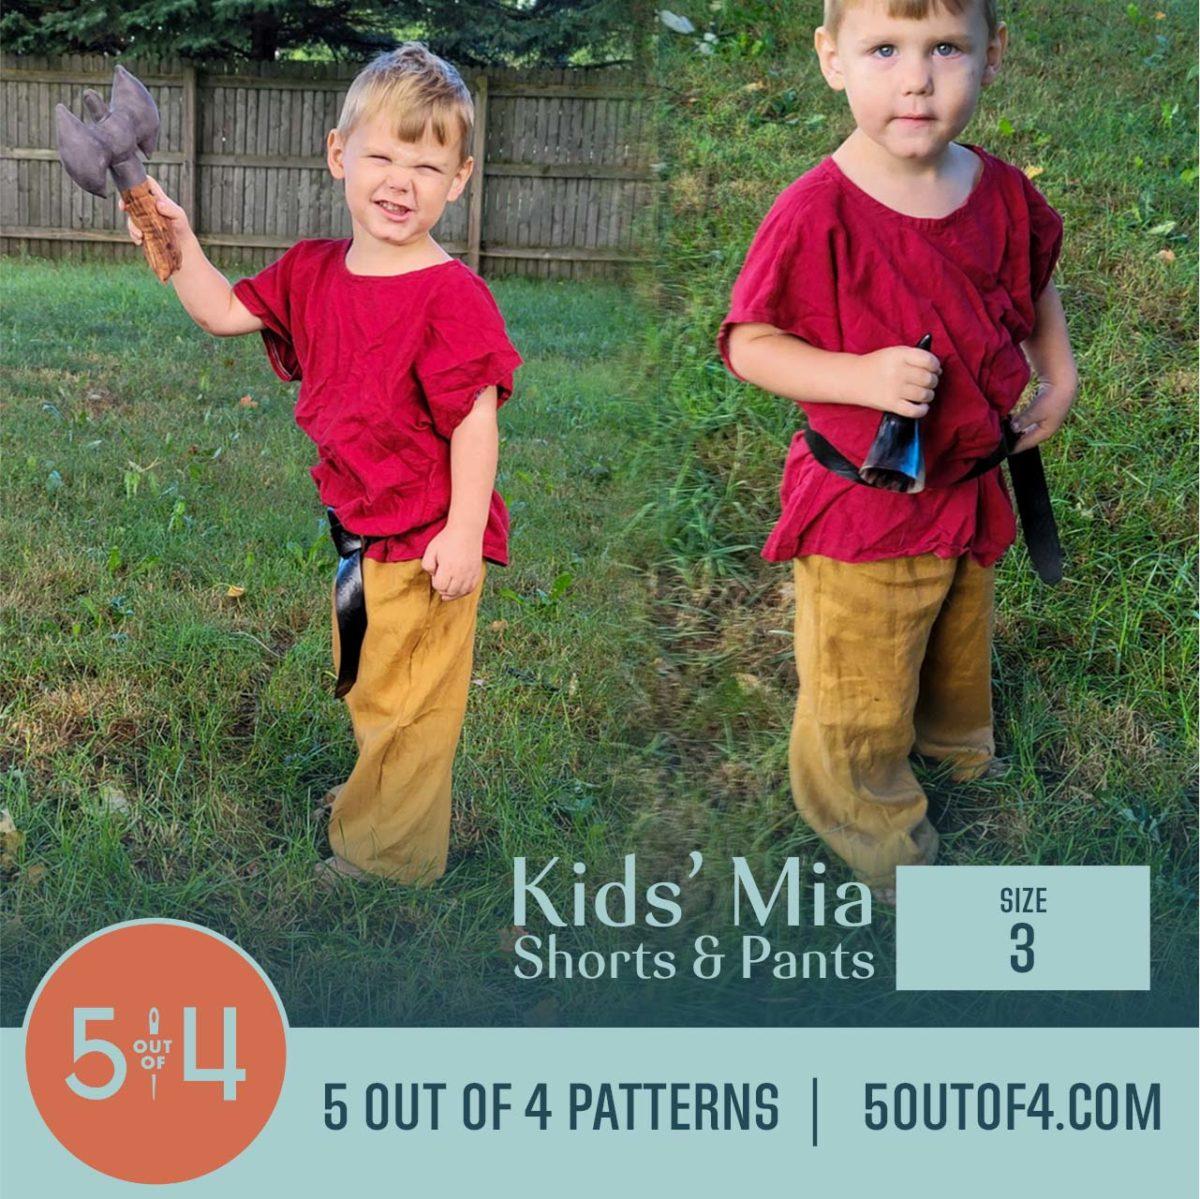 5oo4 Patterns Kids' Mia Pants Size 3